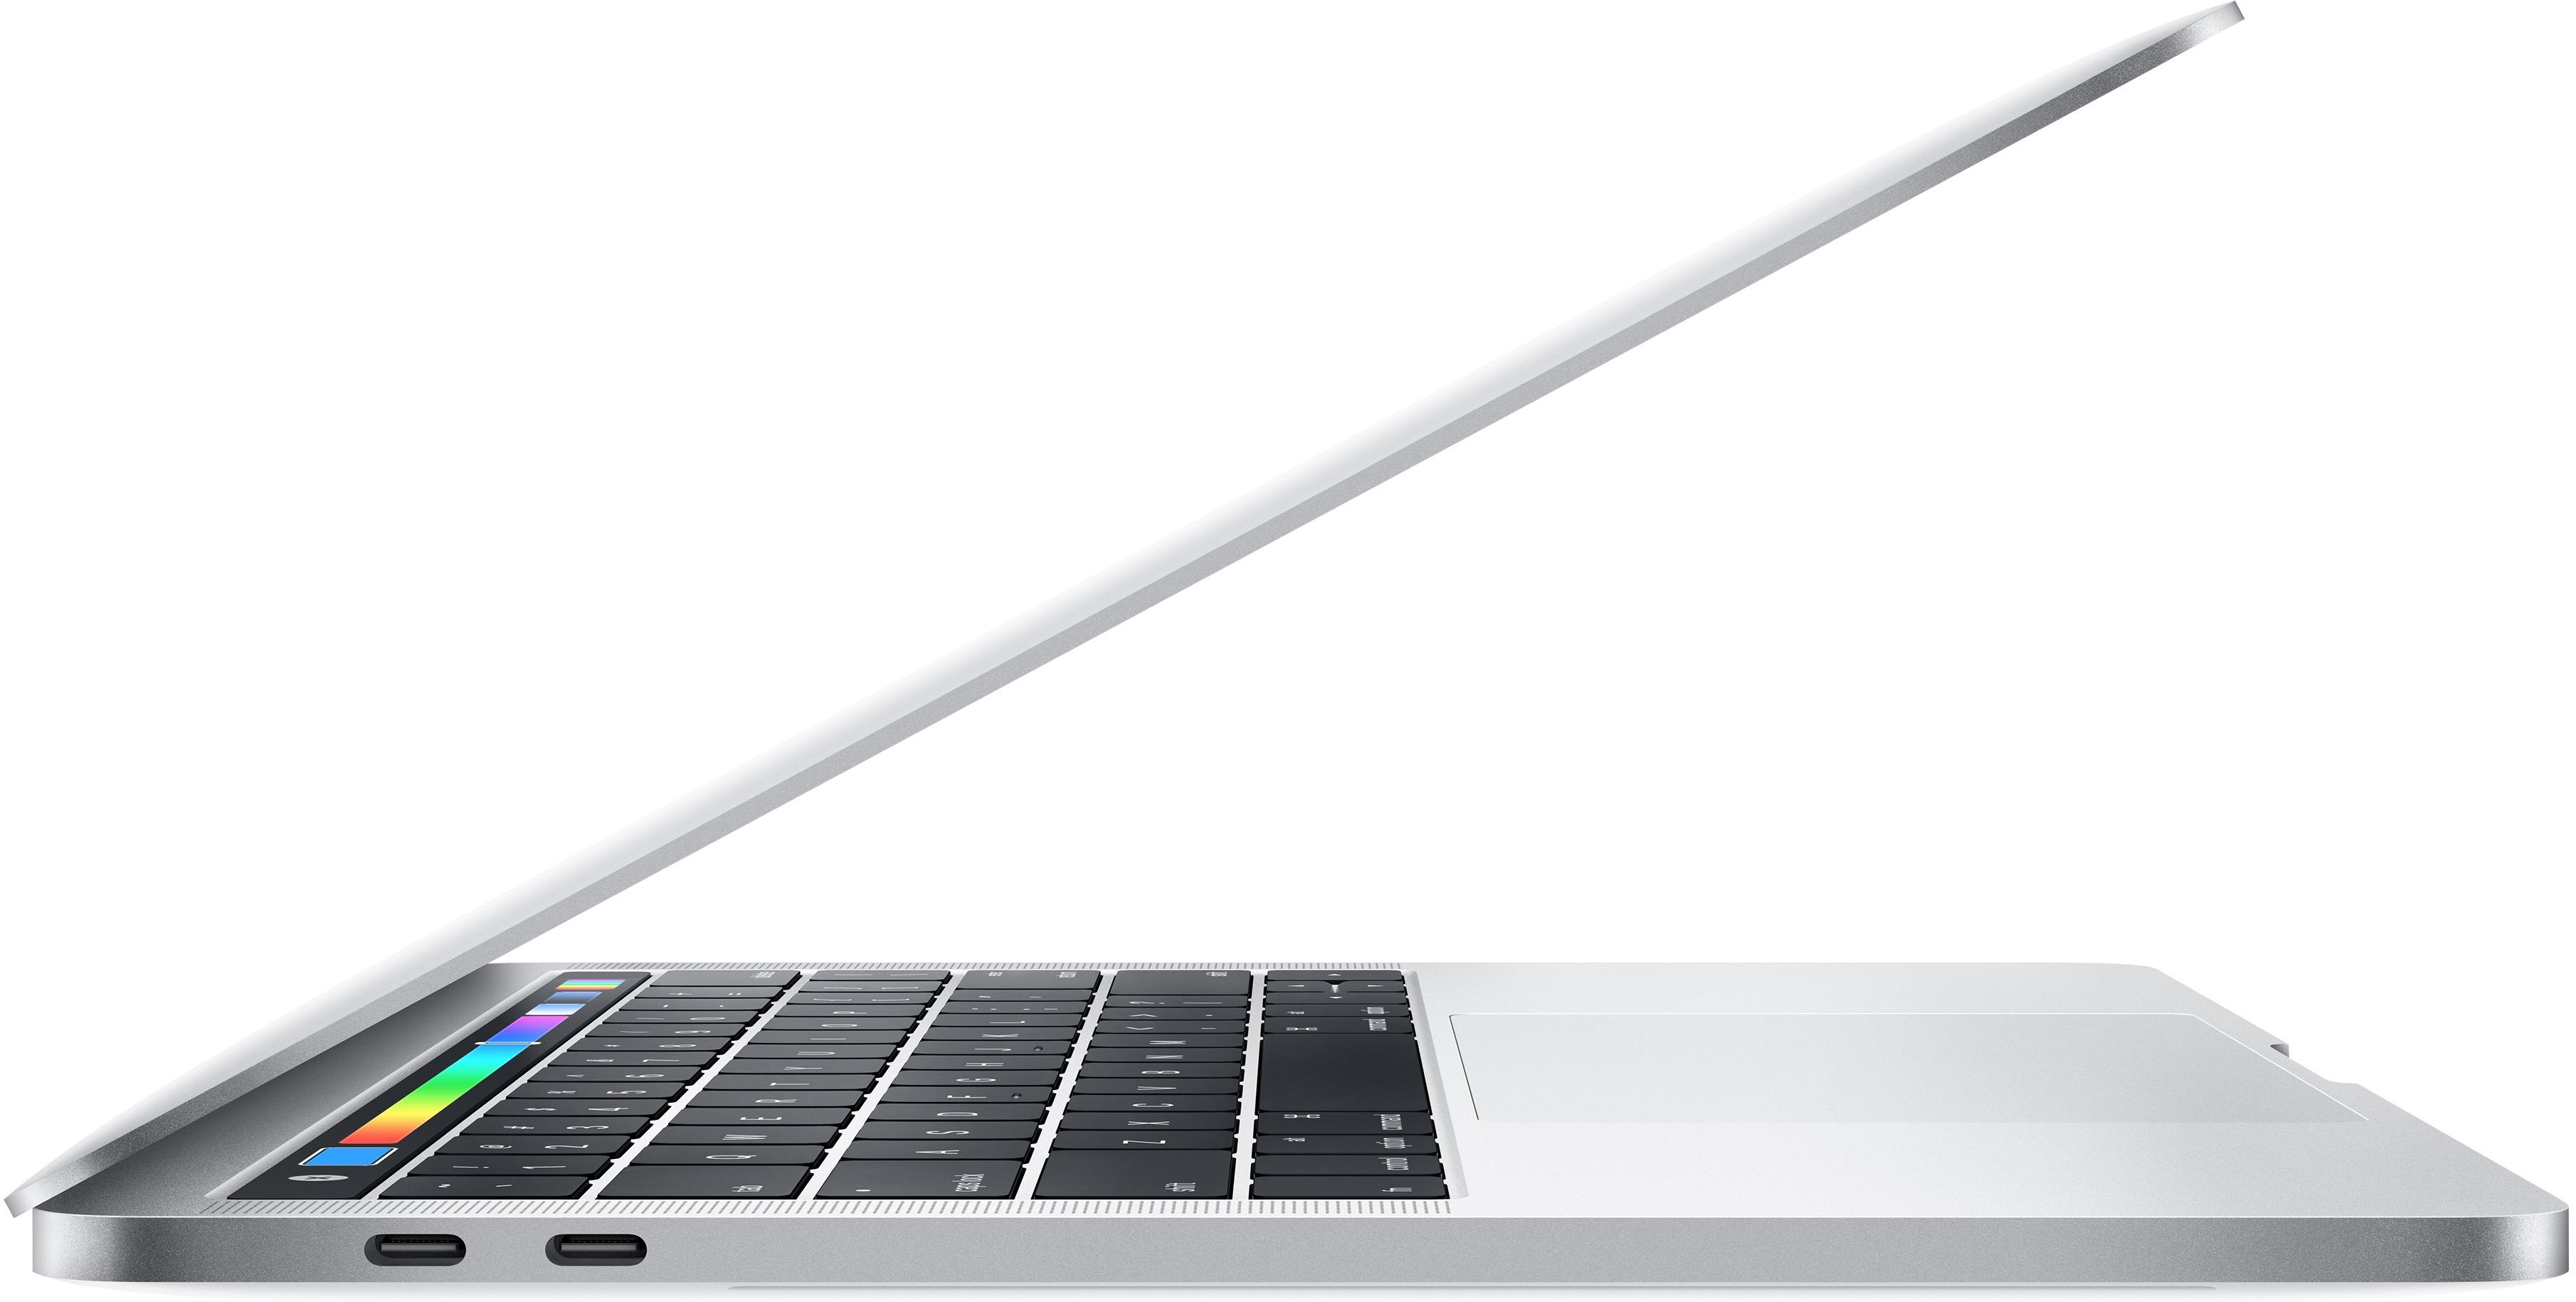 MacBook Pro com Thunderbolt 3